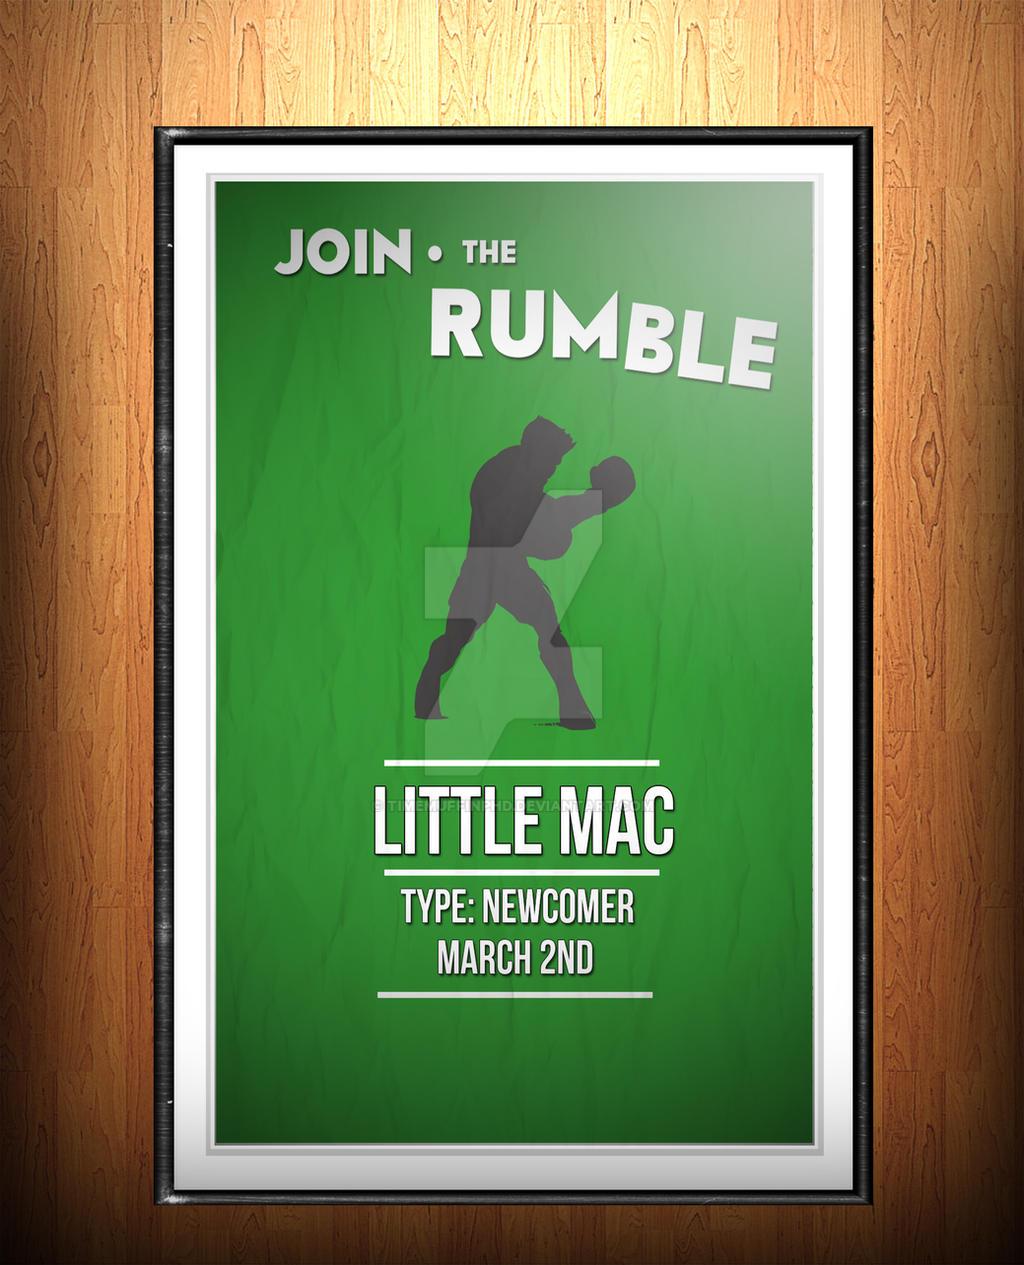 Poster design for mac - Poster Design For Mac Gallery Of Poster Design For Mac